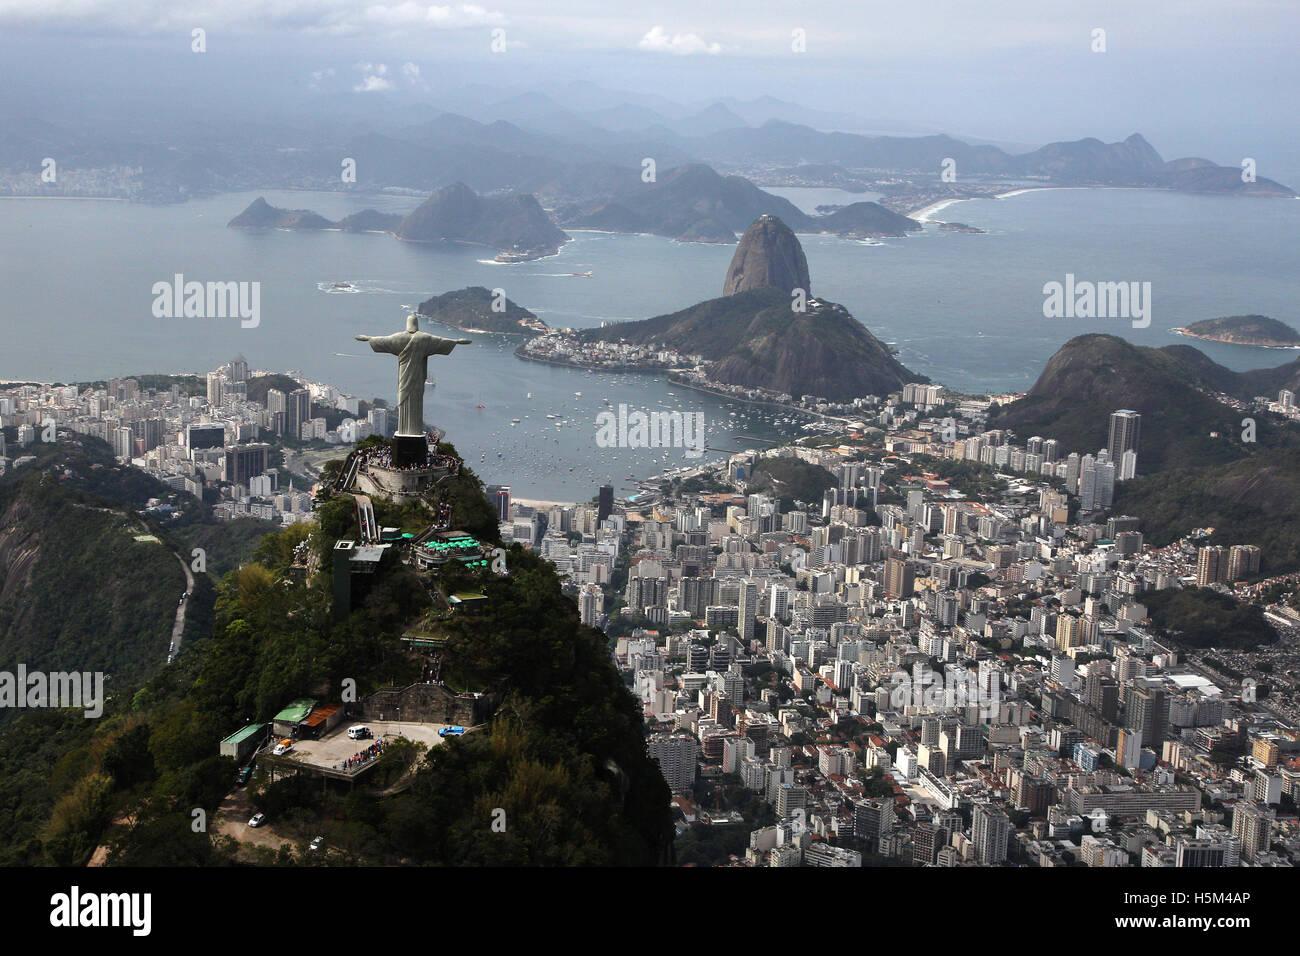 Río de Janeiro, Brasil 2016 Cristo Redentor Cristo redentor ( ) en la cima de la montaña de granito de Imagen De Stock